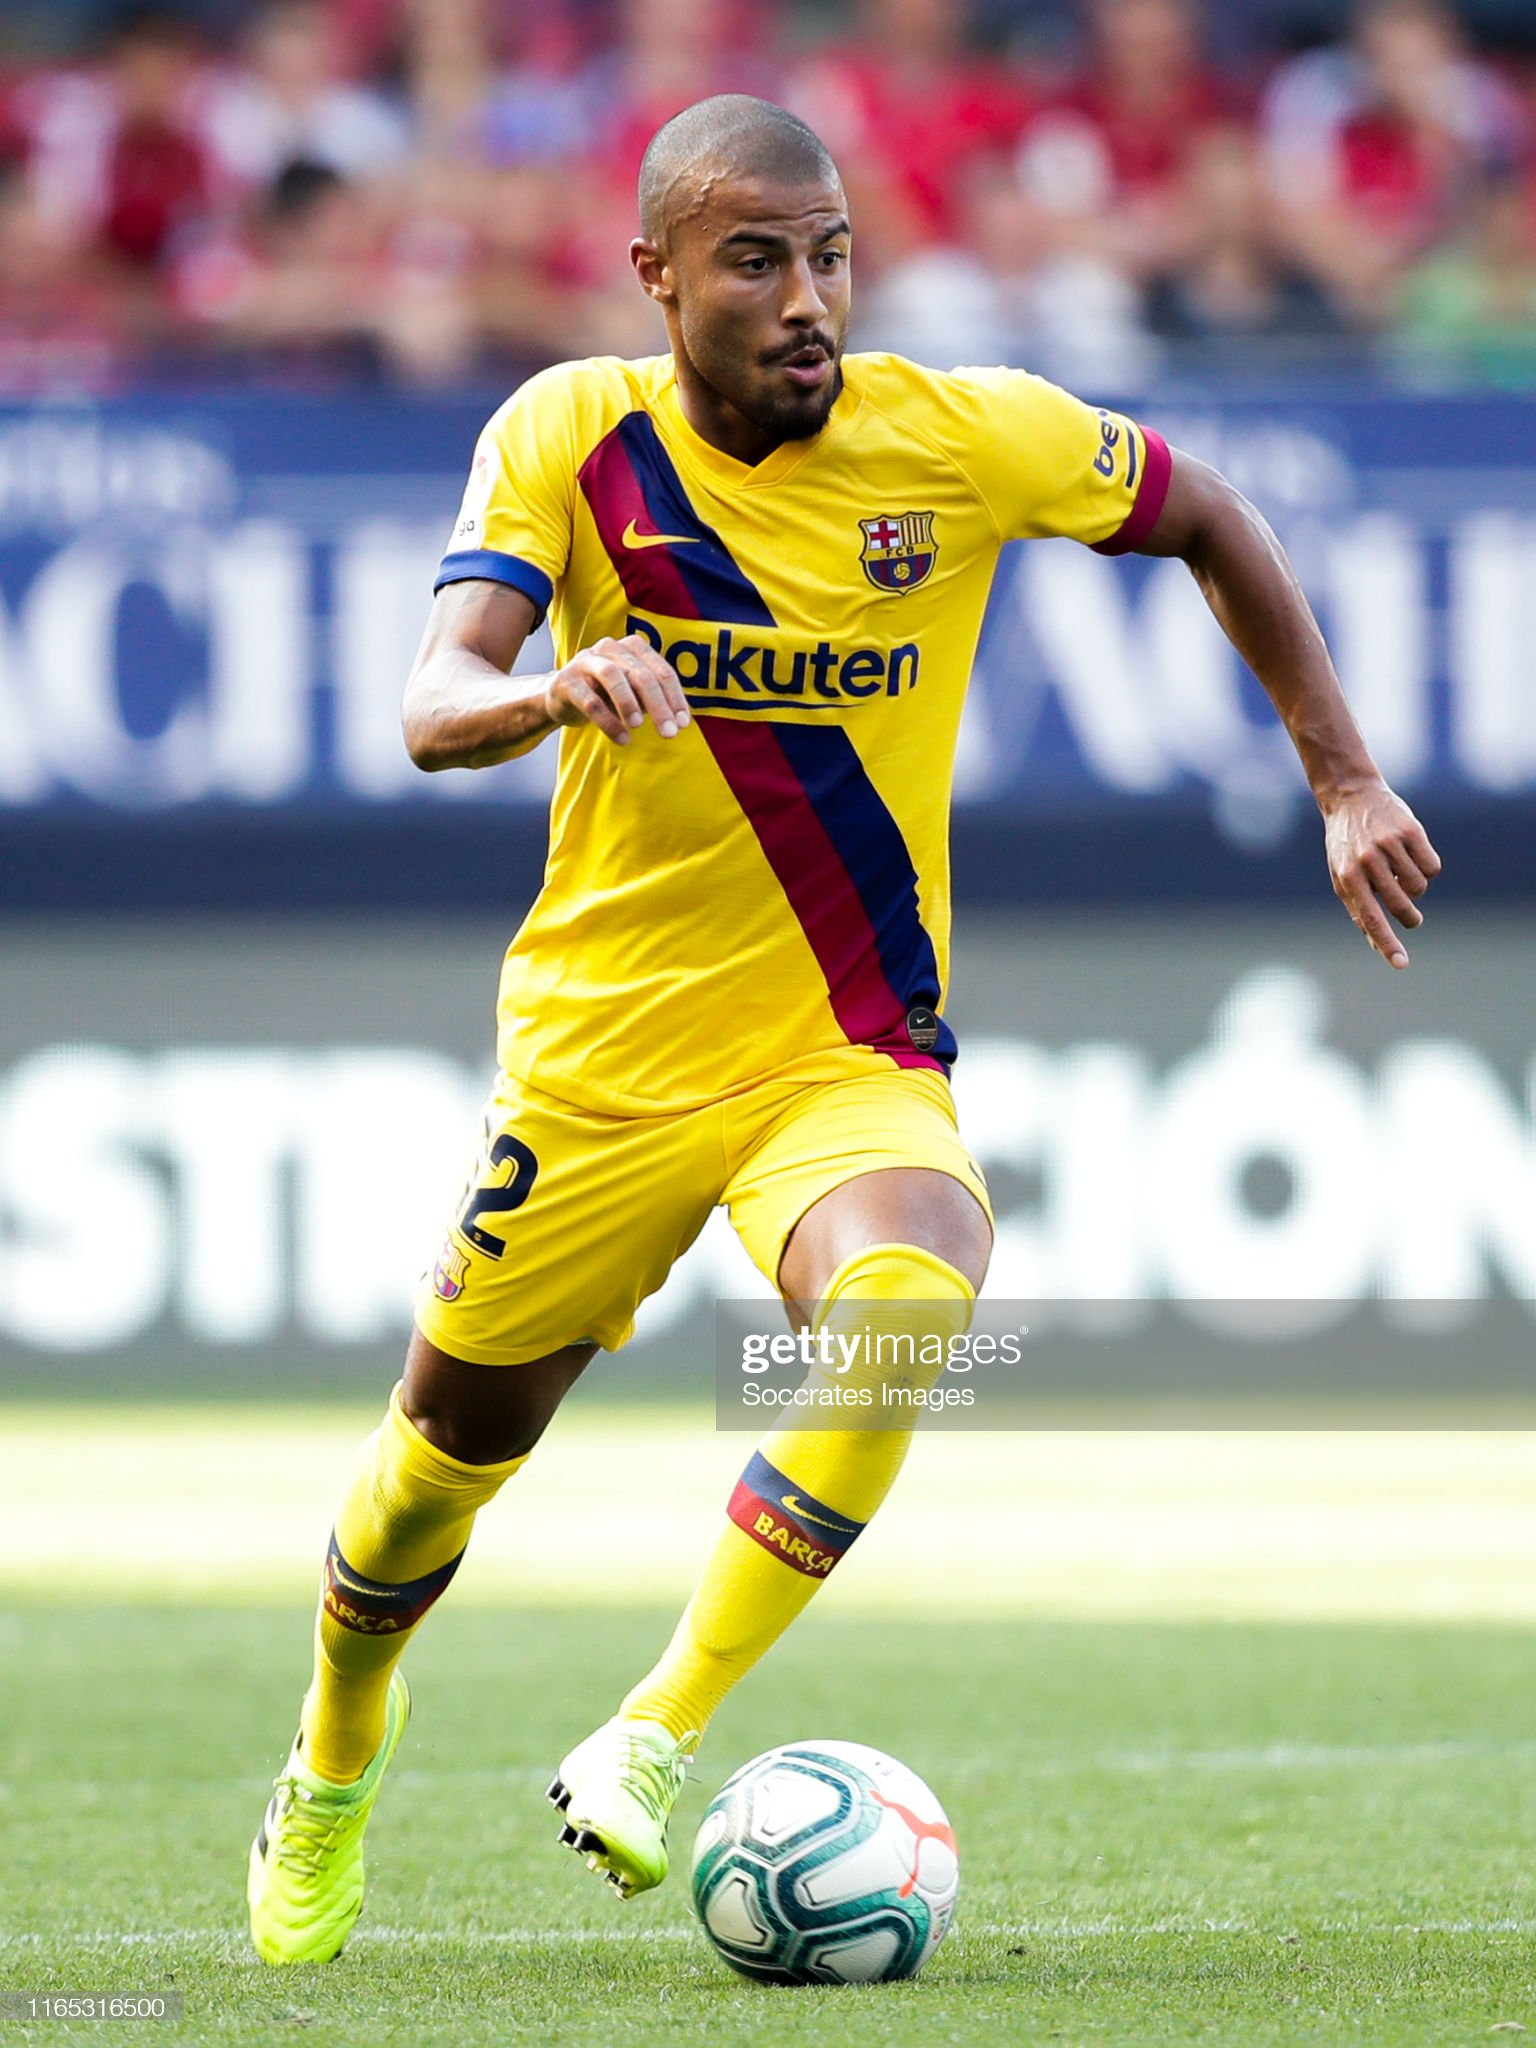 صور مباراة : أوساسونا - برشلونة 2-2 ( 31-08-2019 )  Rafinha-of-fc-barcelona-during-the-la-liga-santander-match-between-v-picture-id1165316500?s=2048x2048